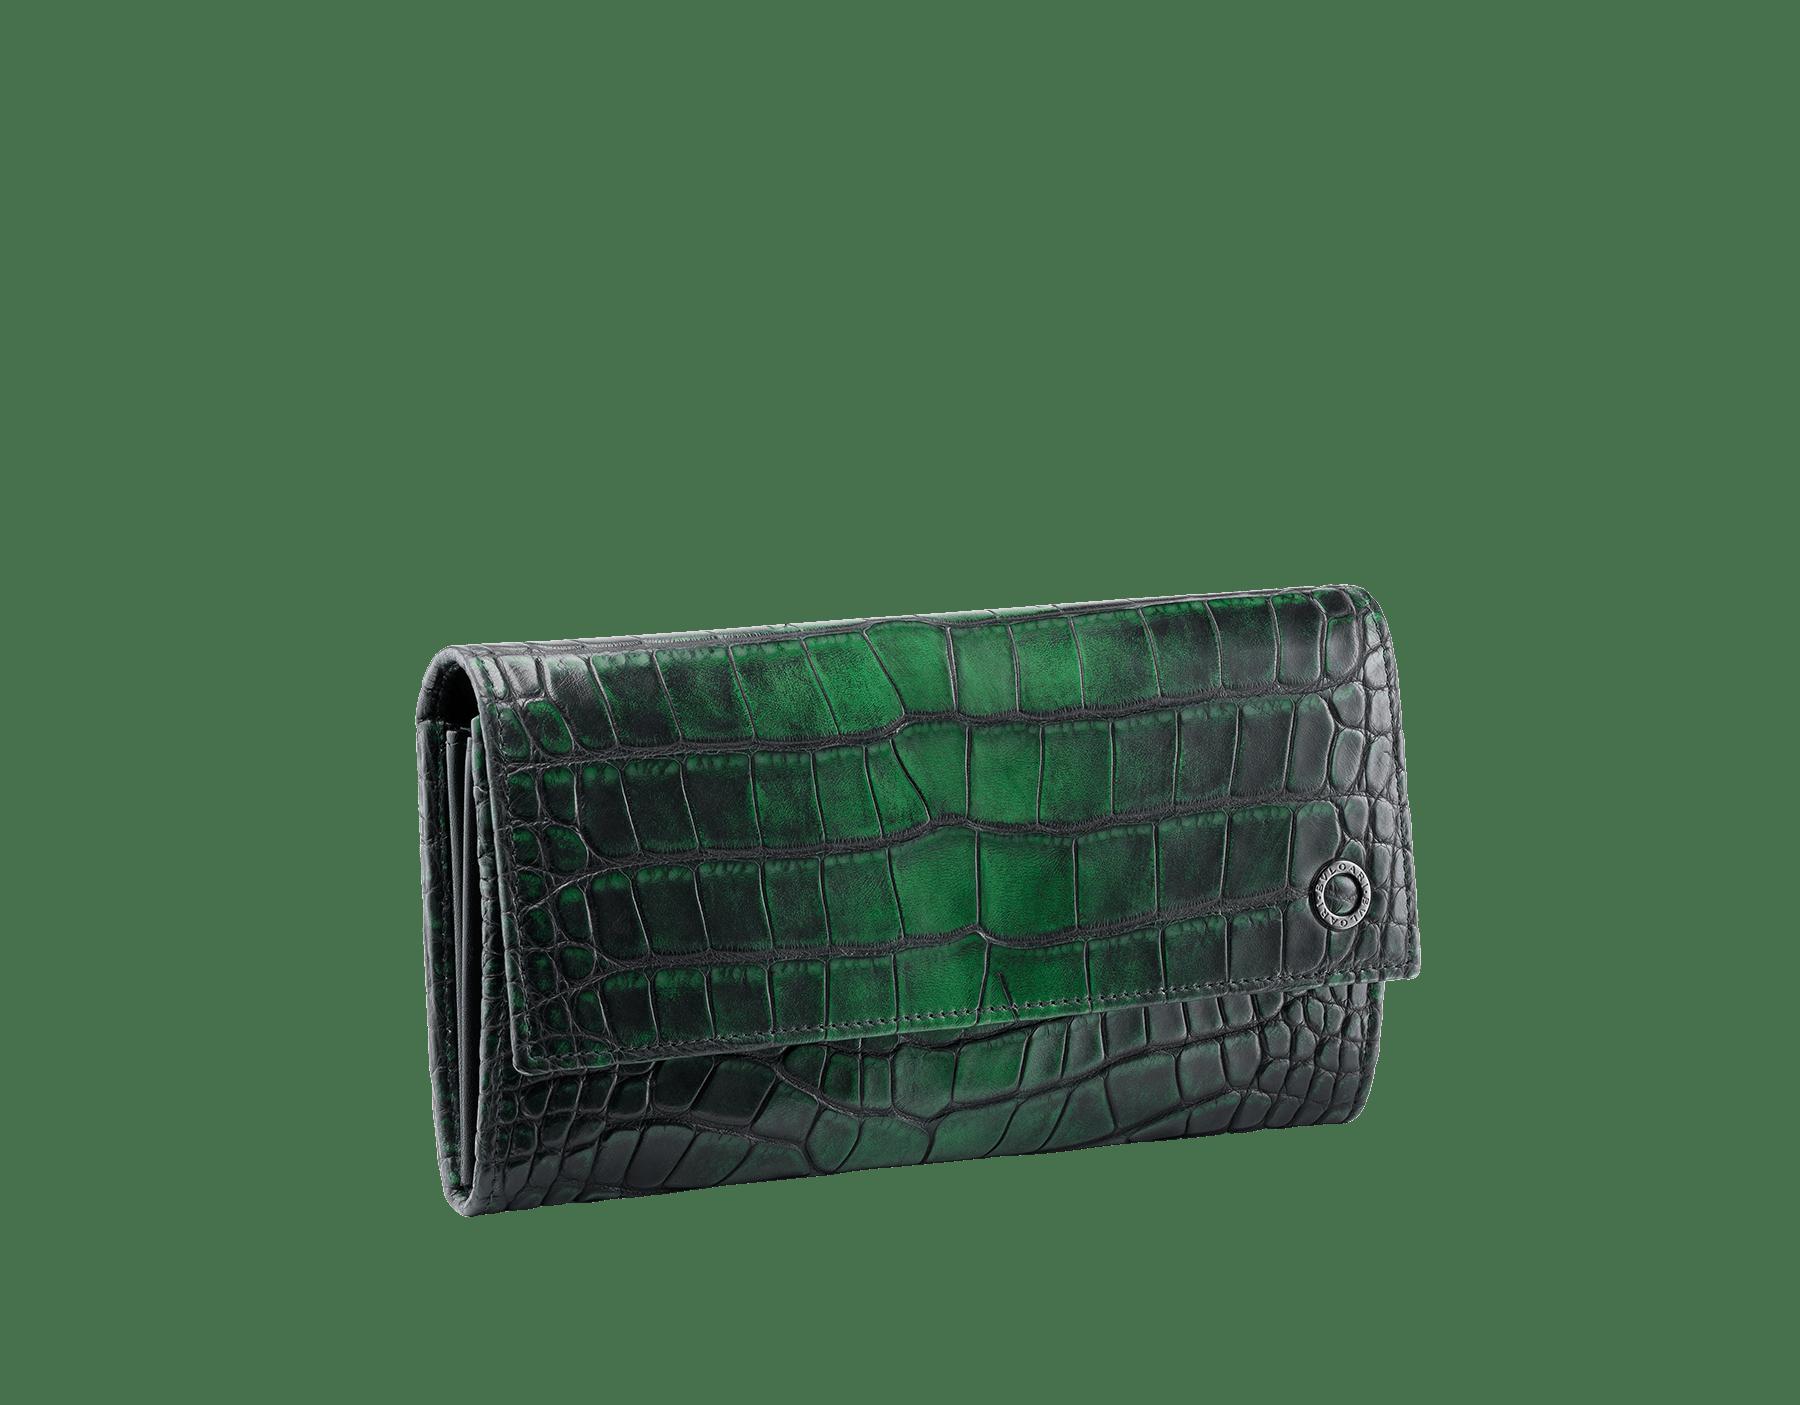 Man wallet pochette in Jungle green alligator skin and black smooth calf leather, with brass dark ruthenium plated hardware featuring the Bulgari-Bulgari motif. BBM-WLT-POC-10C-HE image 1